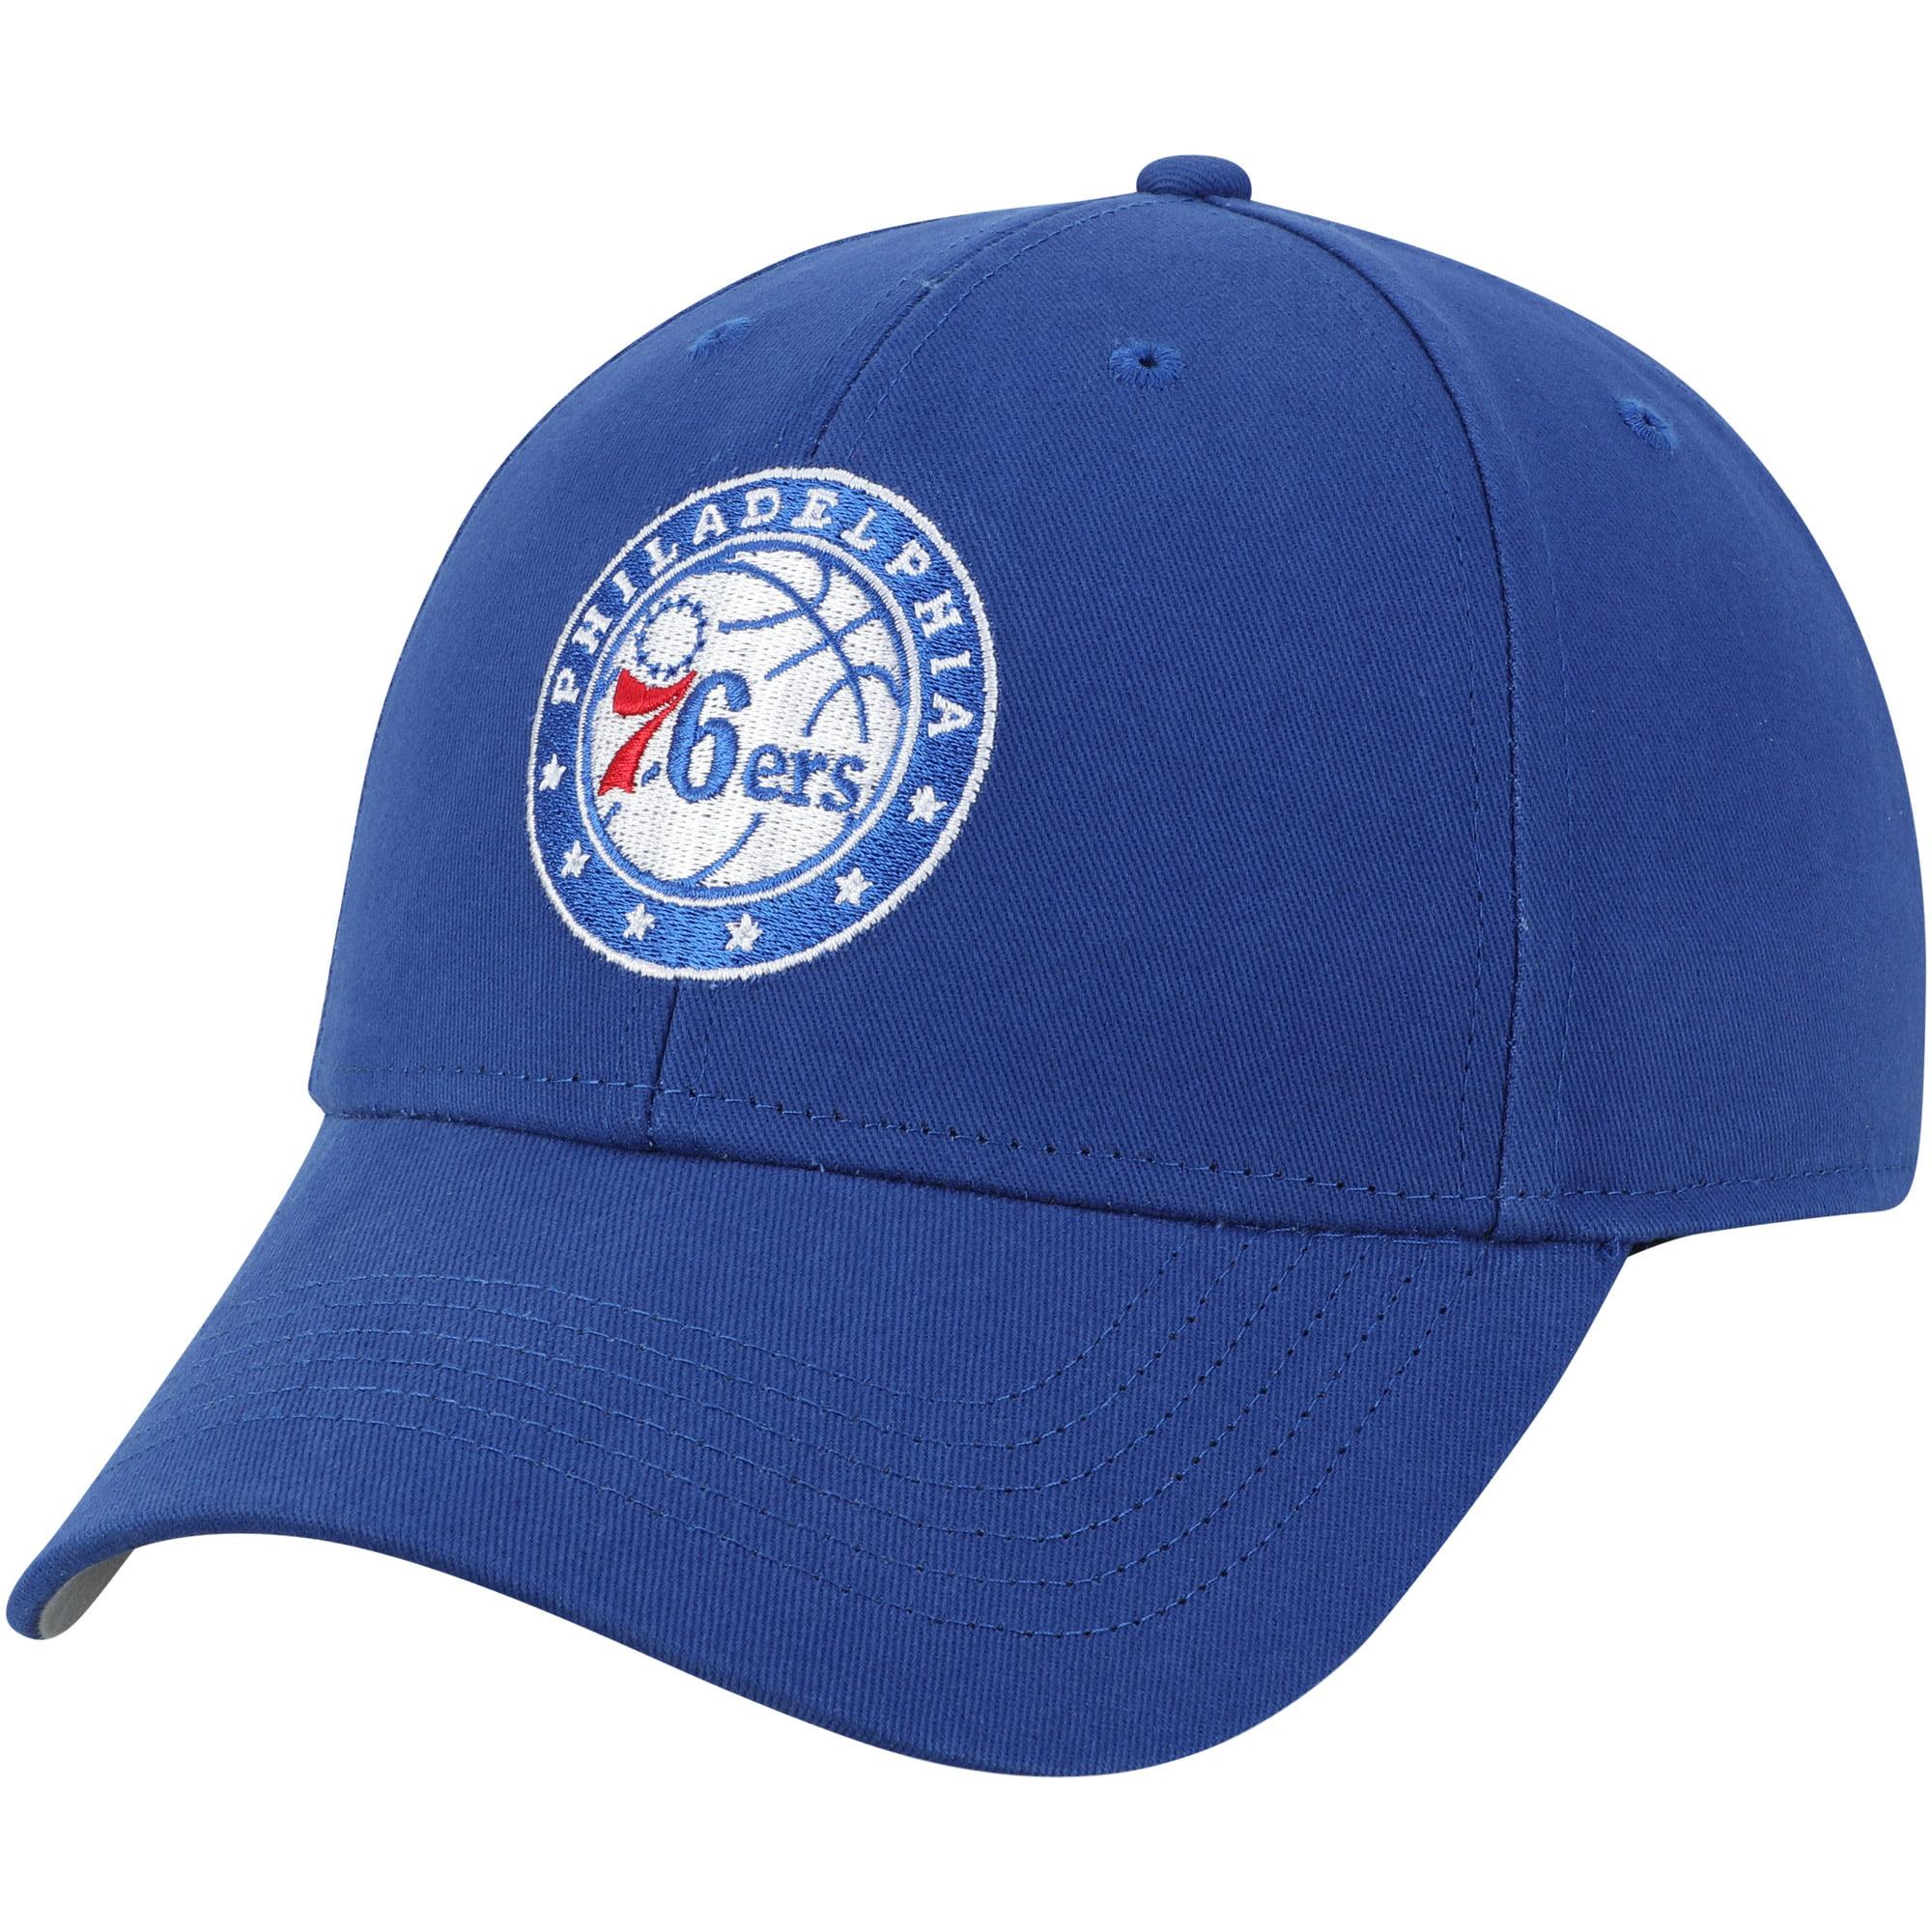 Men's Royal Philadelphia 76ers Mass Basic Adjustable Hat - OSFA